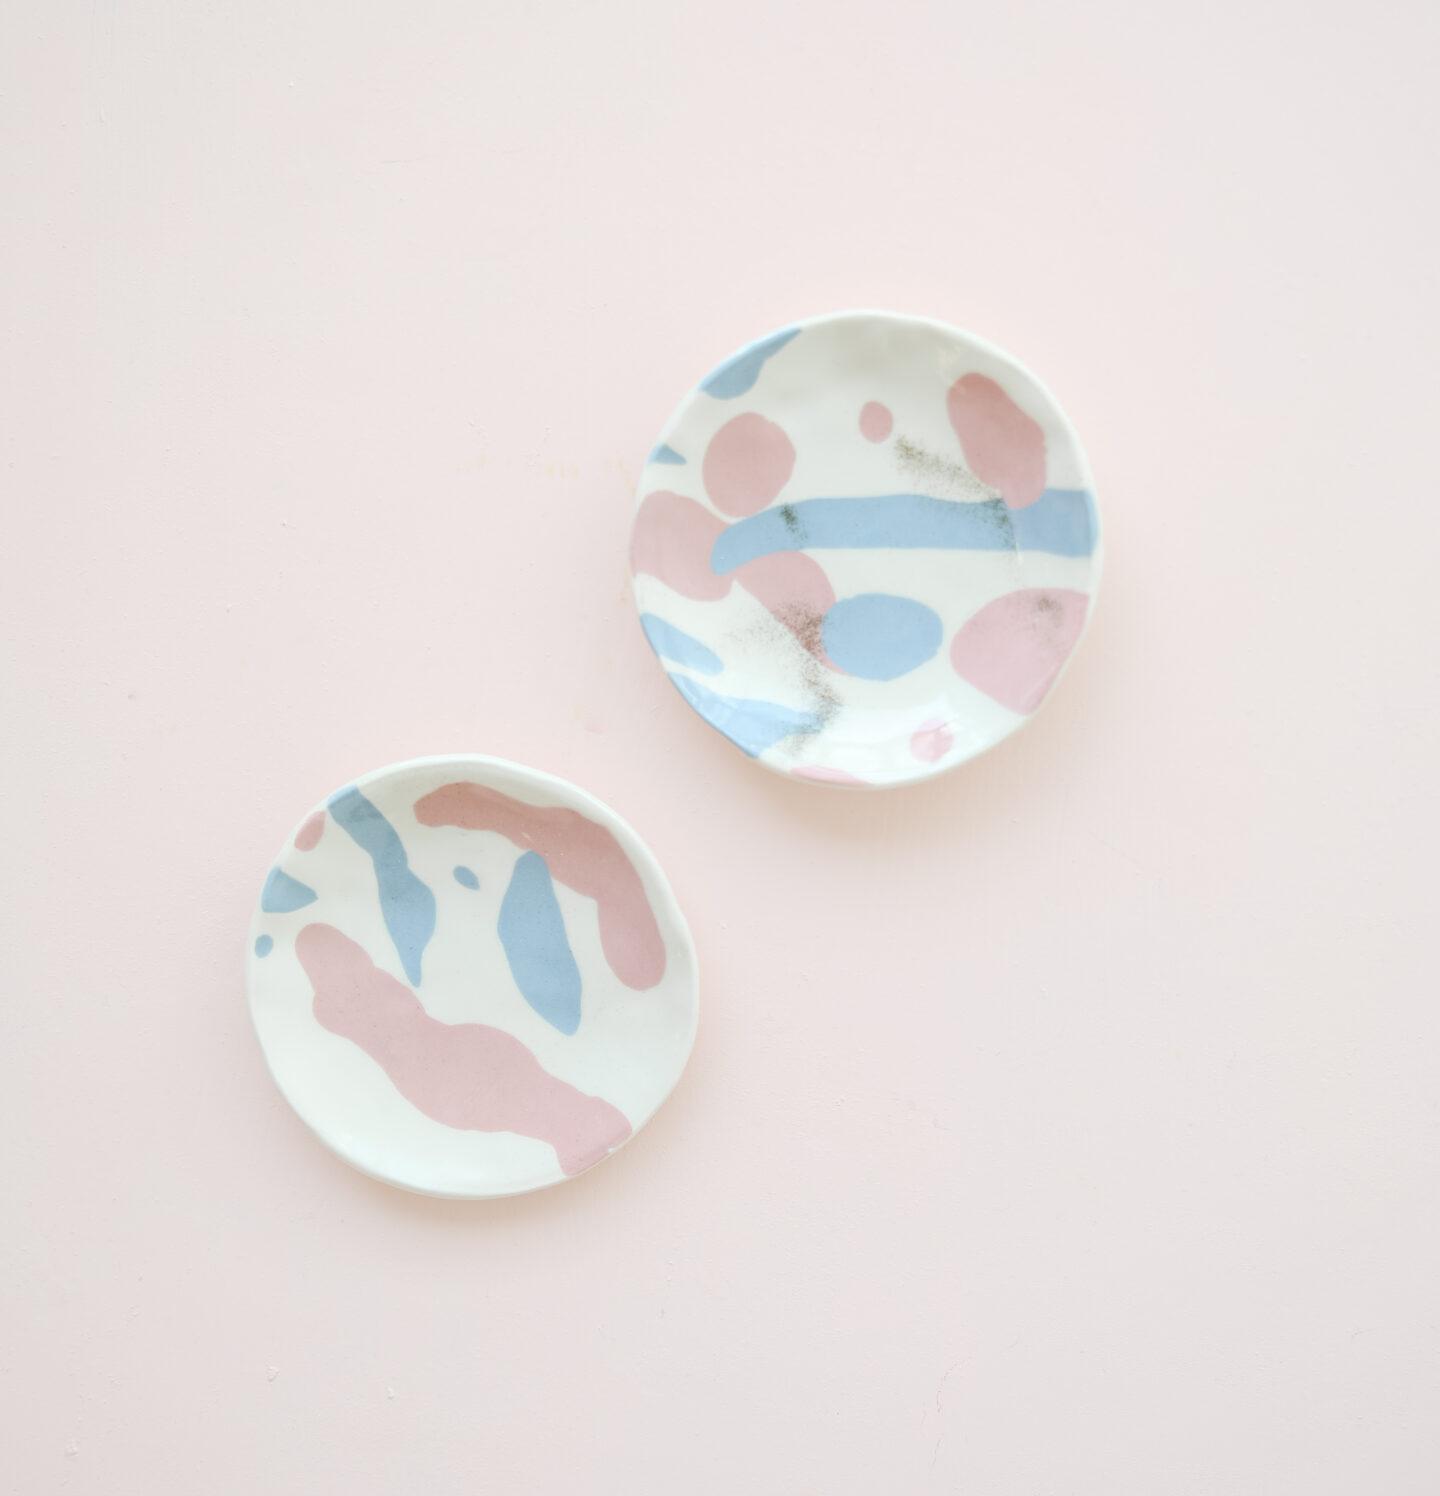 Nerikomi pink and blue plates